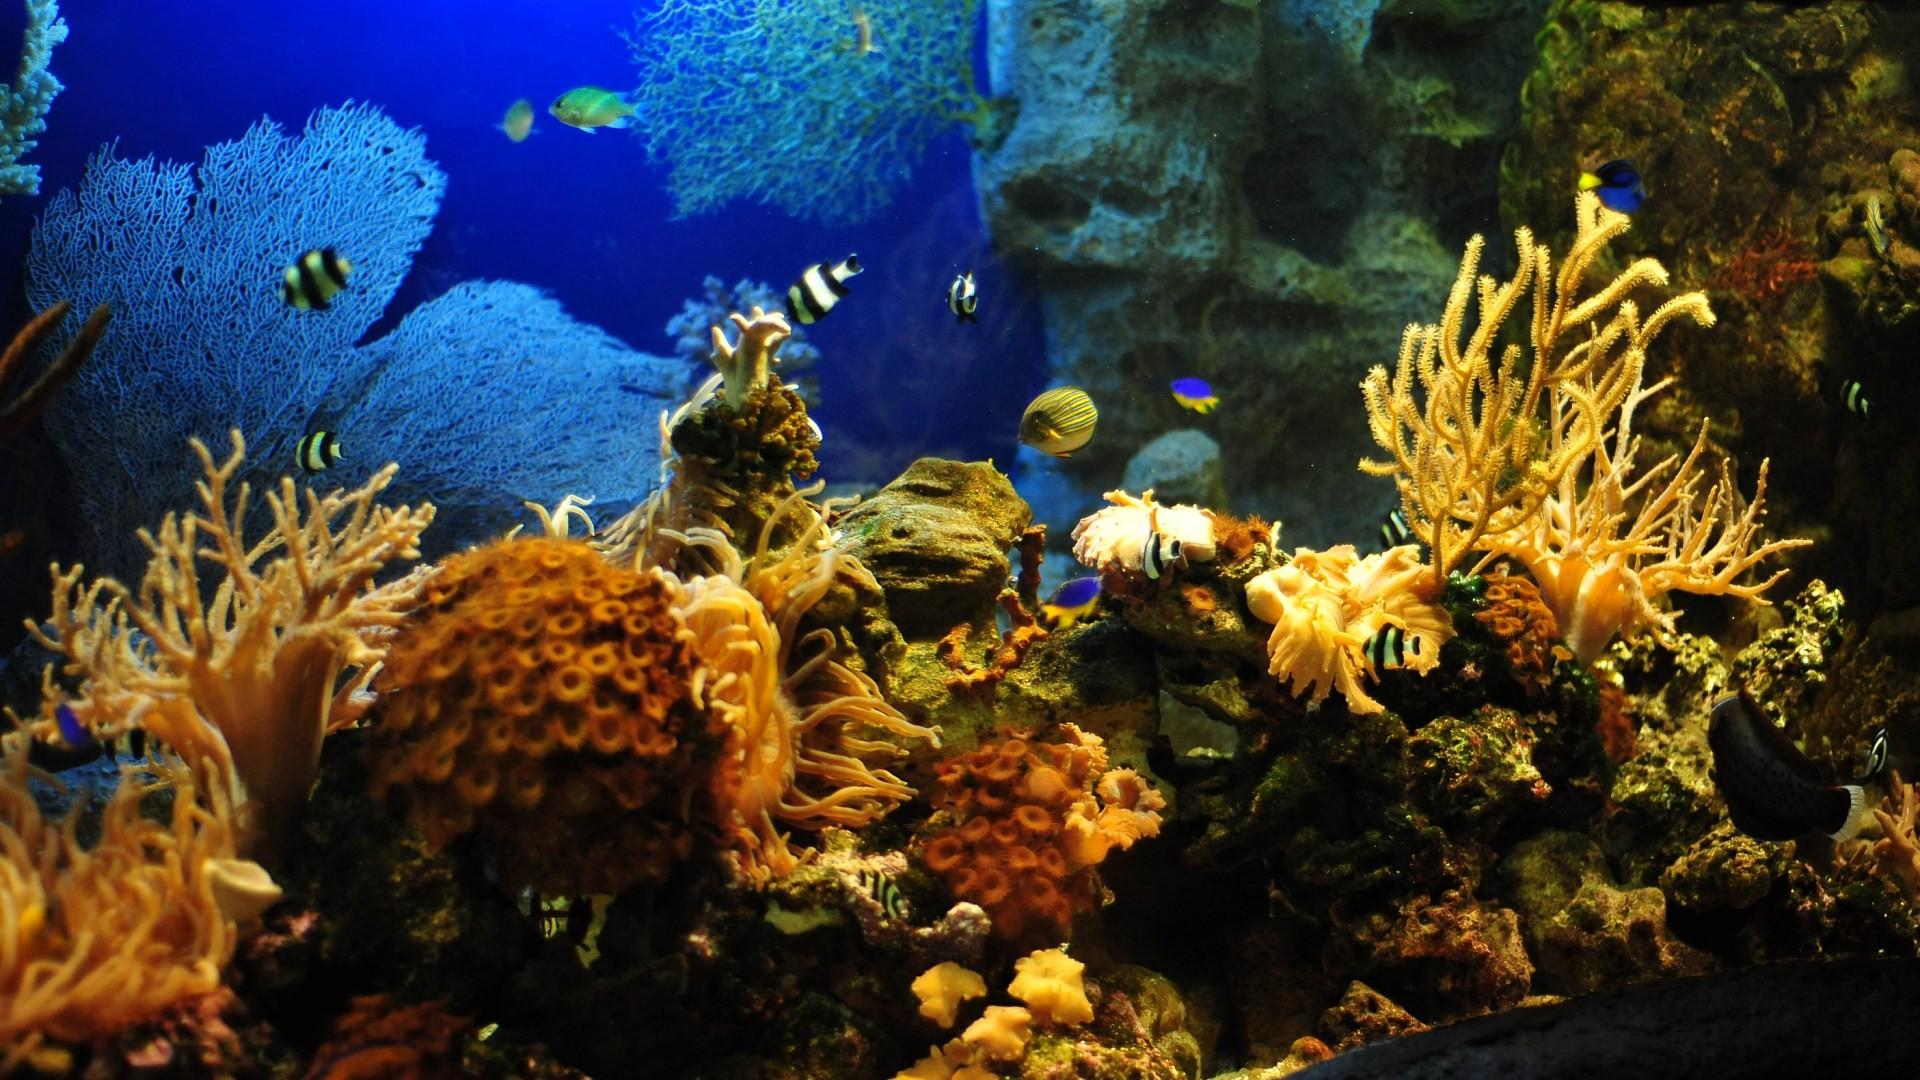 Full Size of Fish Tank Free Fish Tank Wallpaper Wallpapersafari Screensaver  Stirring Photos Concept Q4bd52 Screensavers …